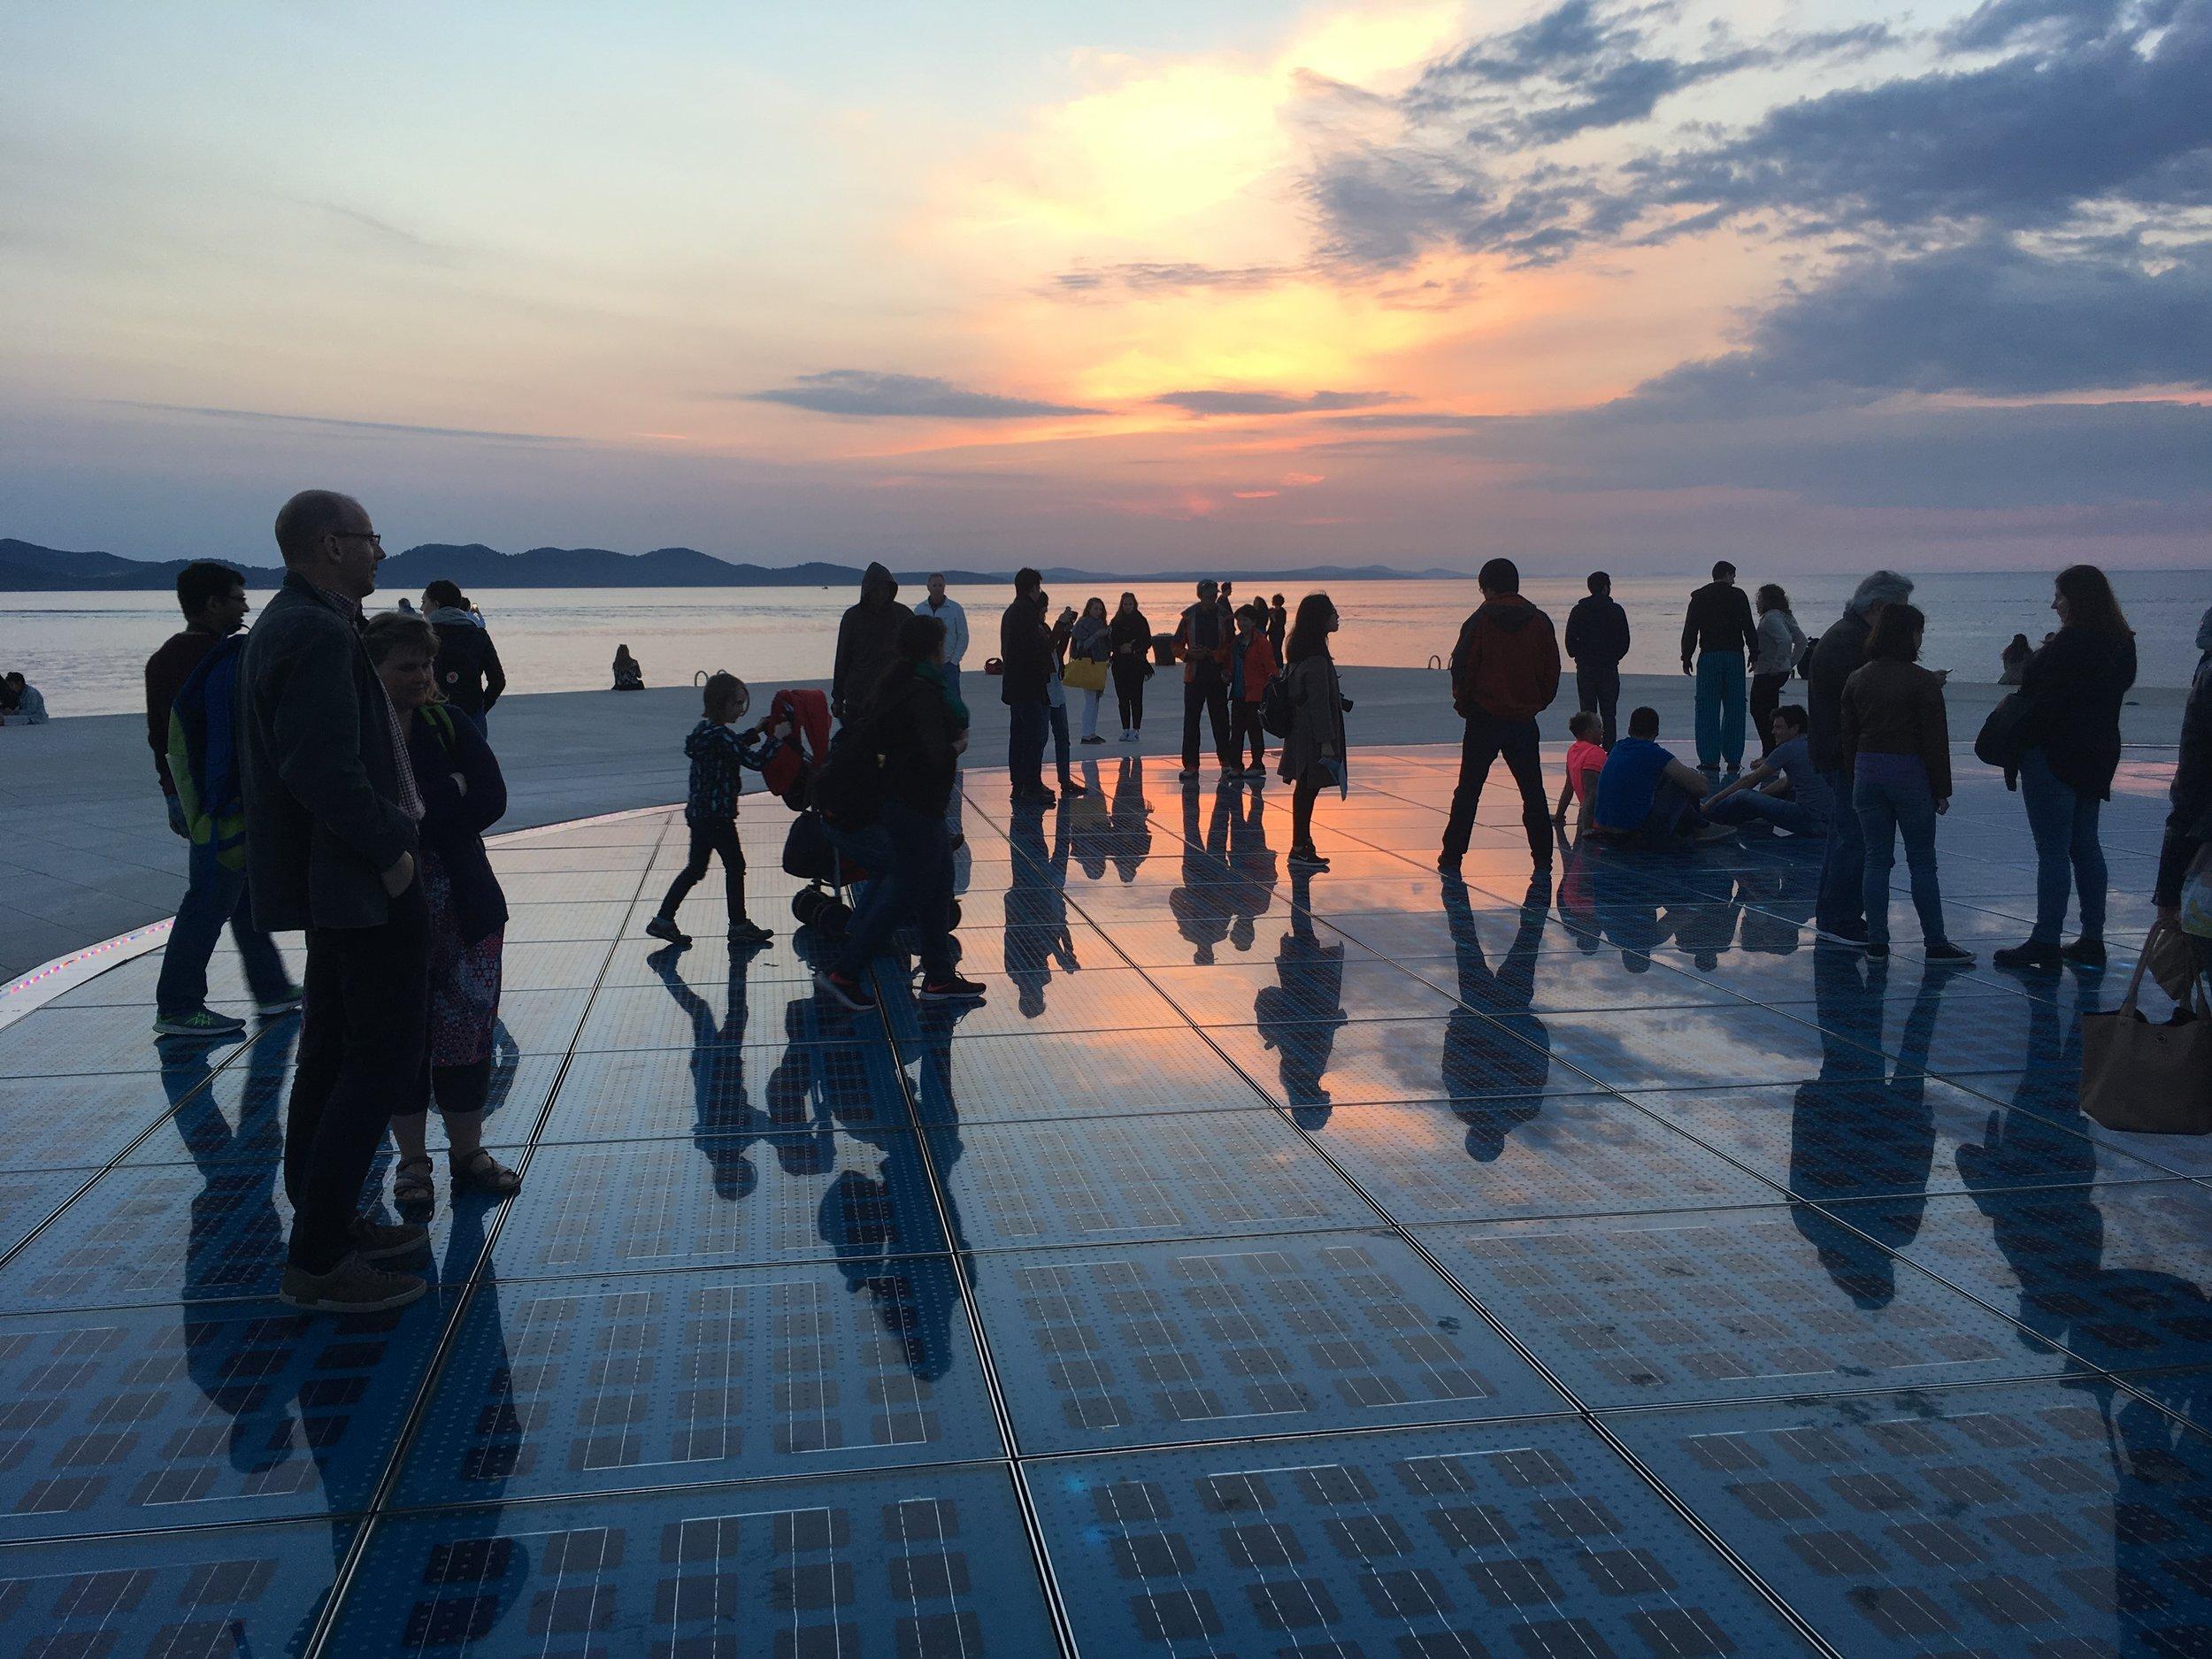 Sun Salutation just before sunset